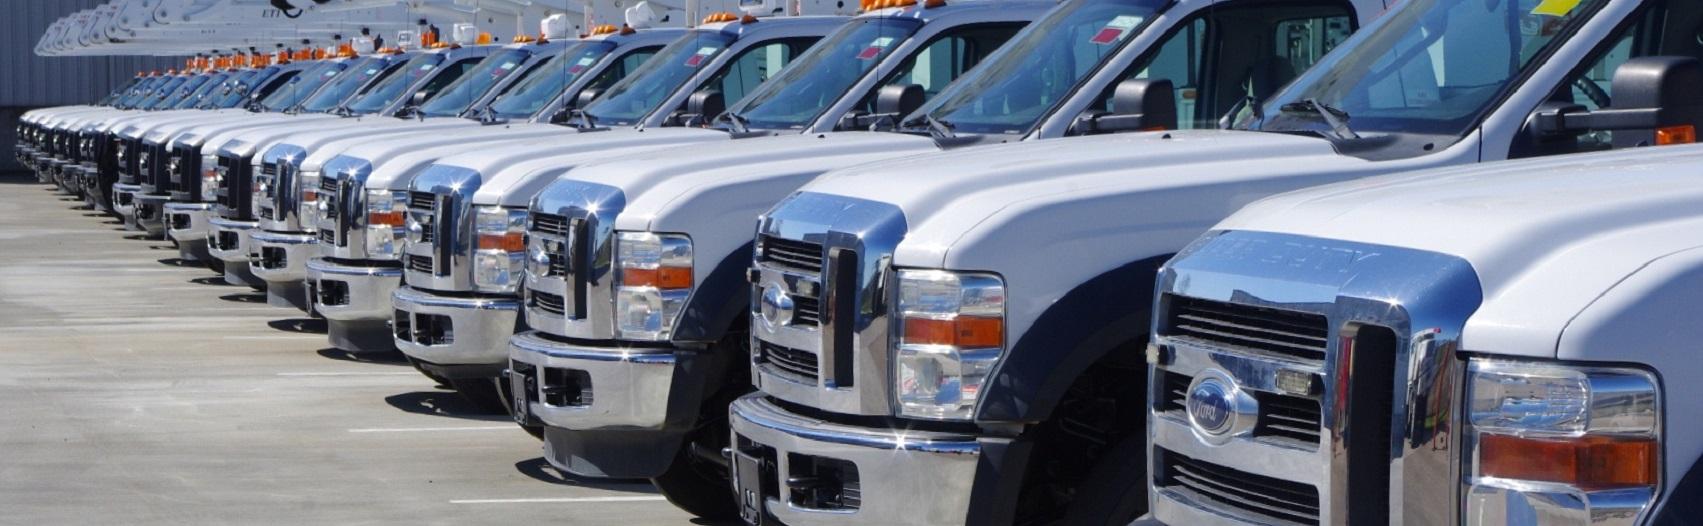 fleet_services